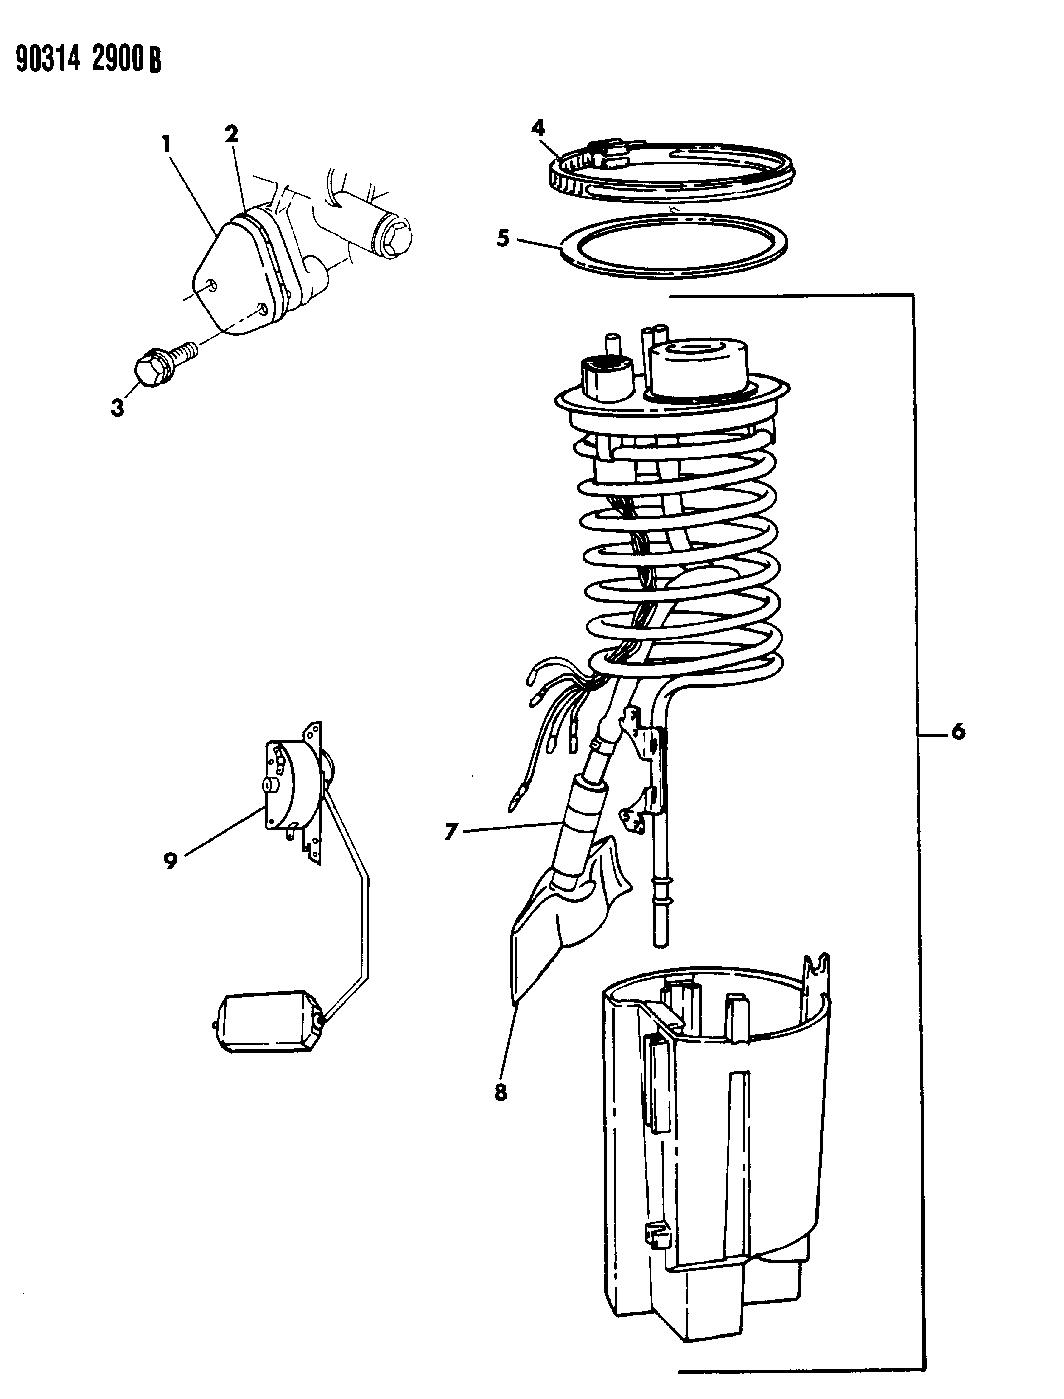 1990 Dodge Ramcharger Fuel Pump Module